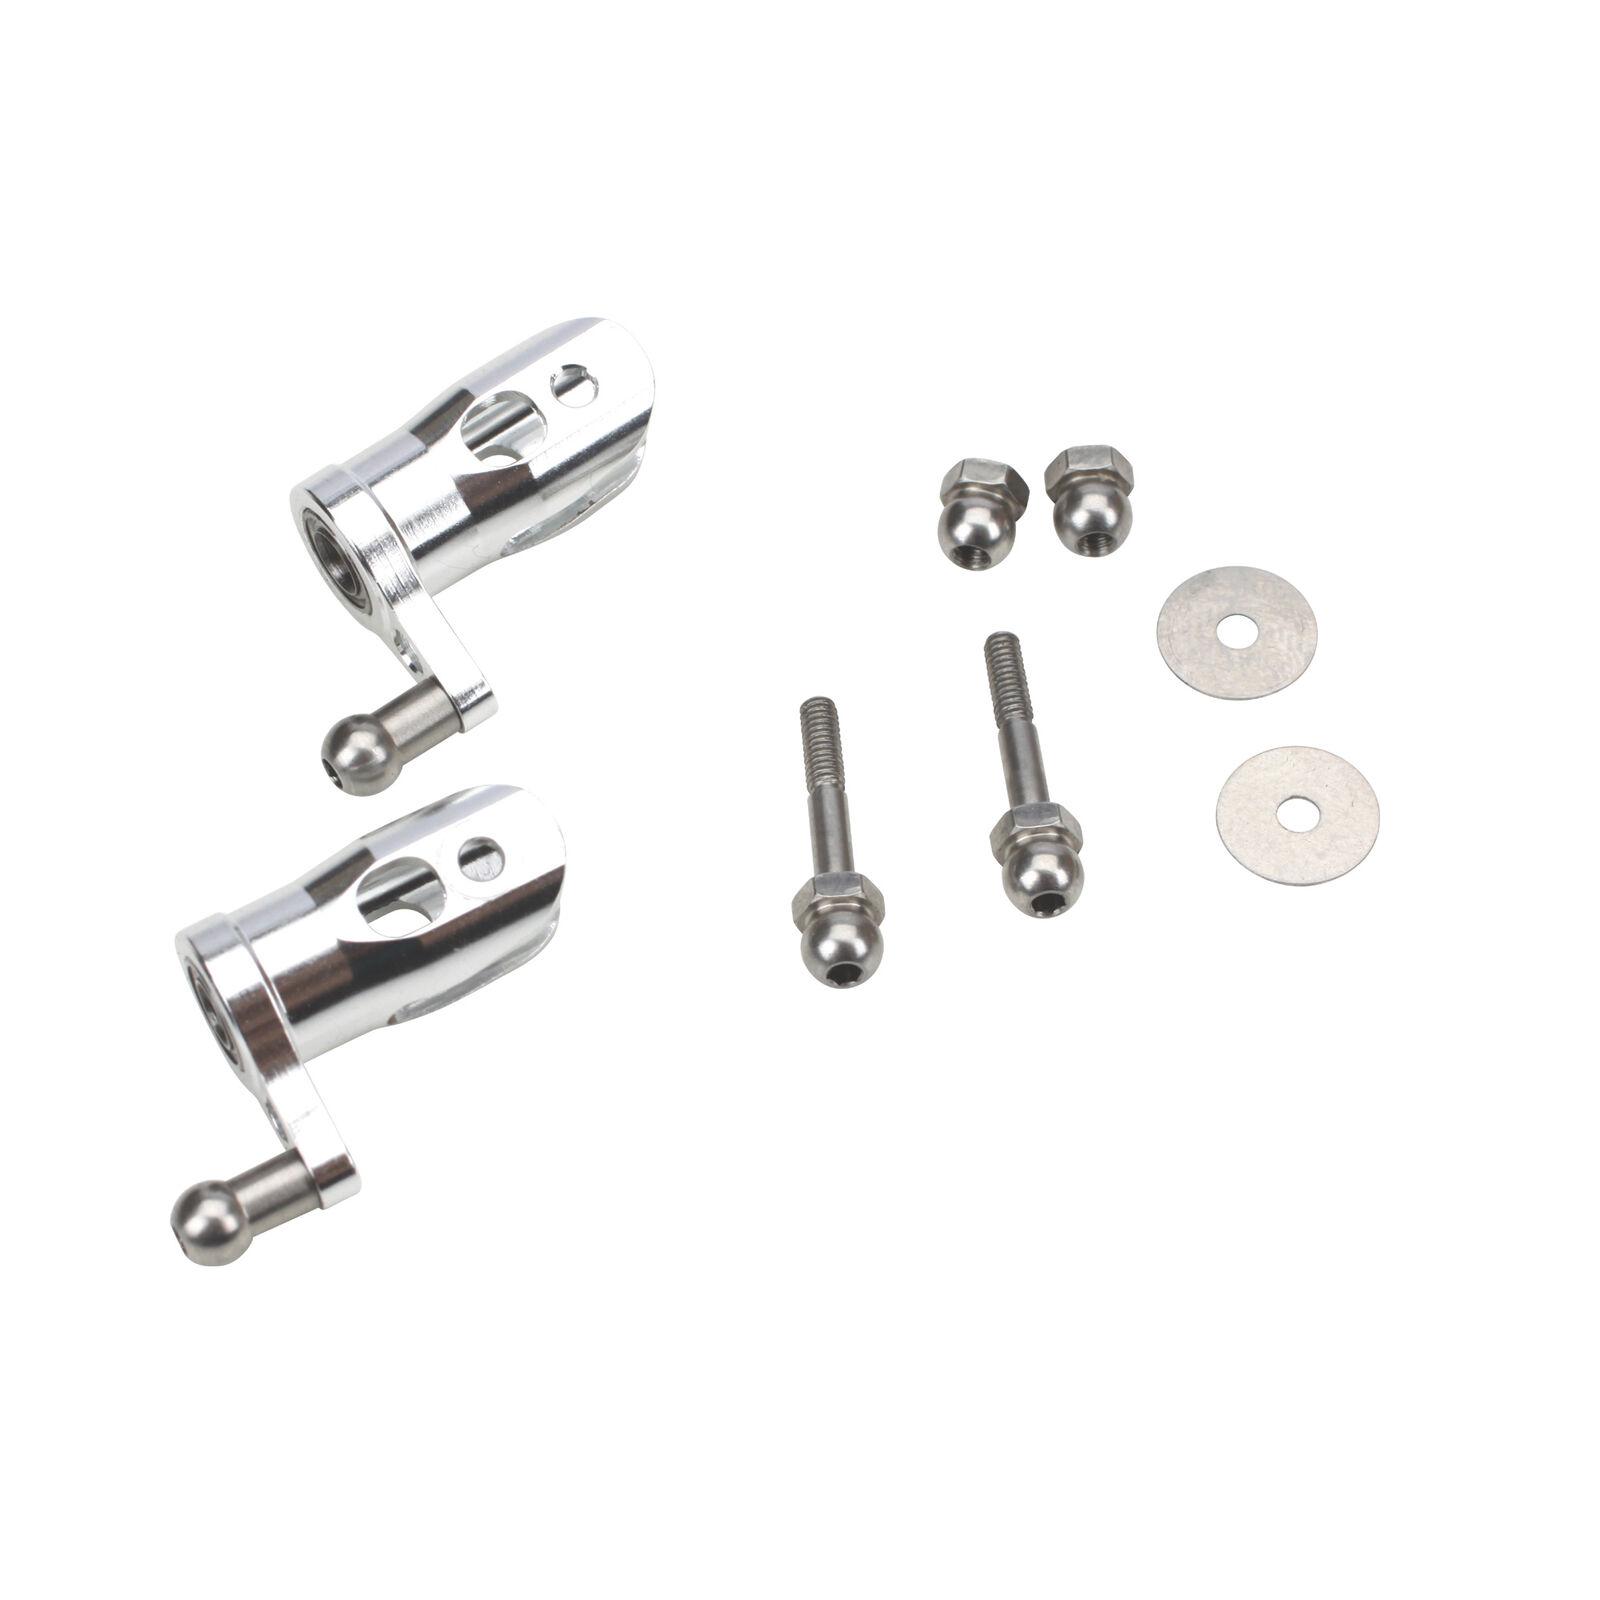 Aluminum Tail Rotor Blade Grp Set Hub: B450